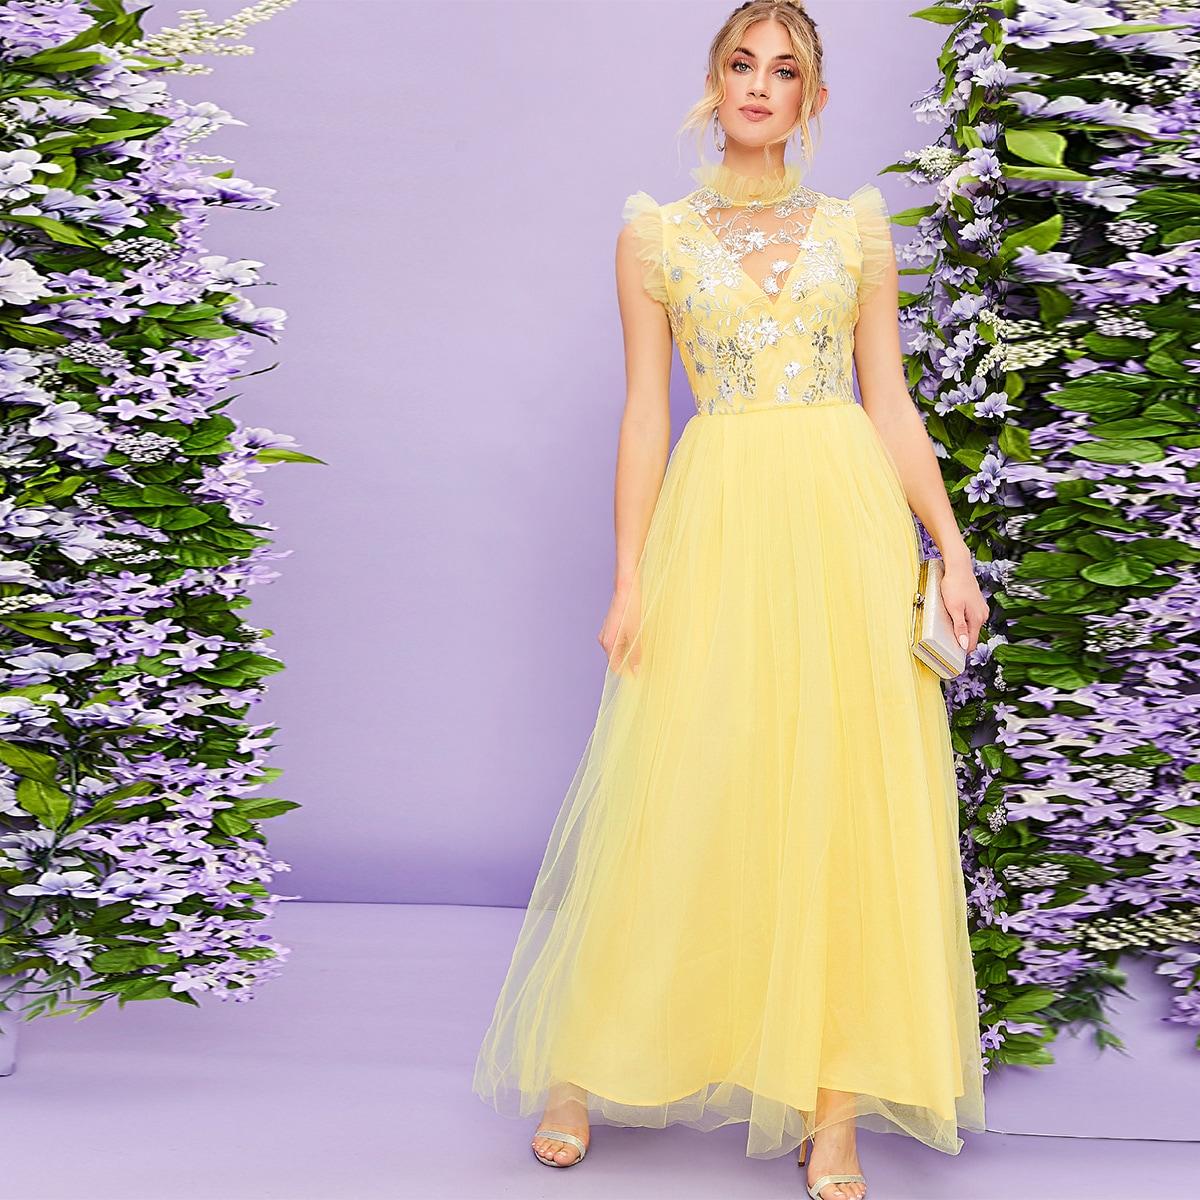 SHEIN / Mock-Neck Ruffle Trim Sequin Embroidery Mesh Dress